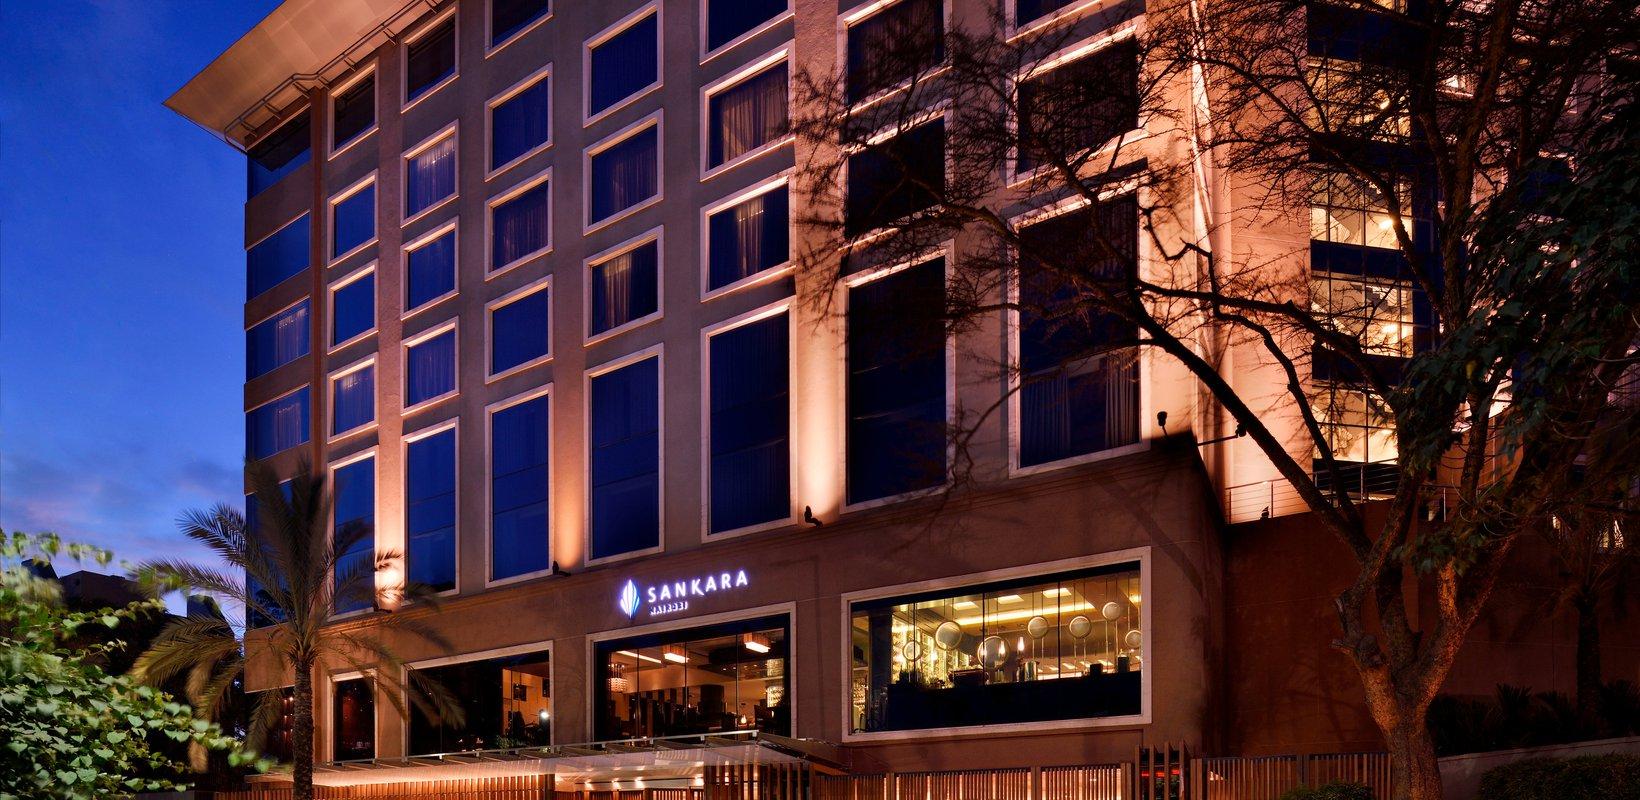 Welcome to Sankara, a 5 star hotel in the heart of Nairobi